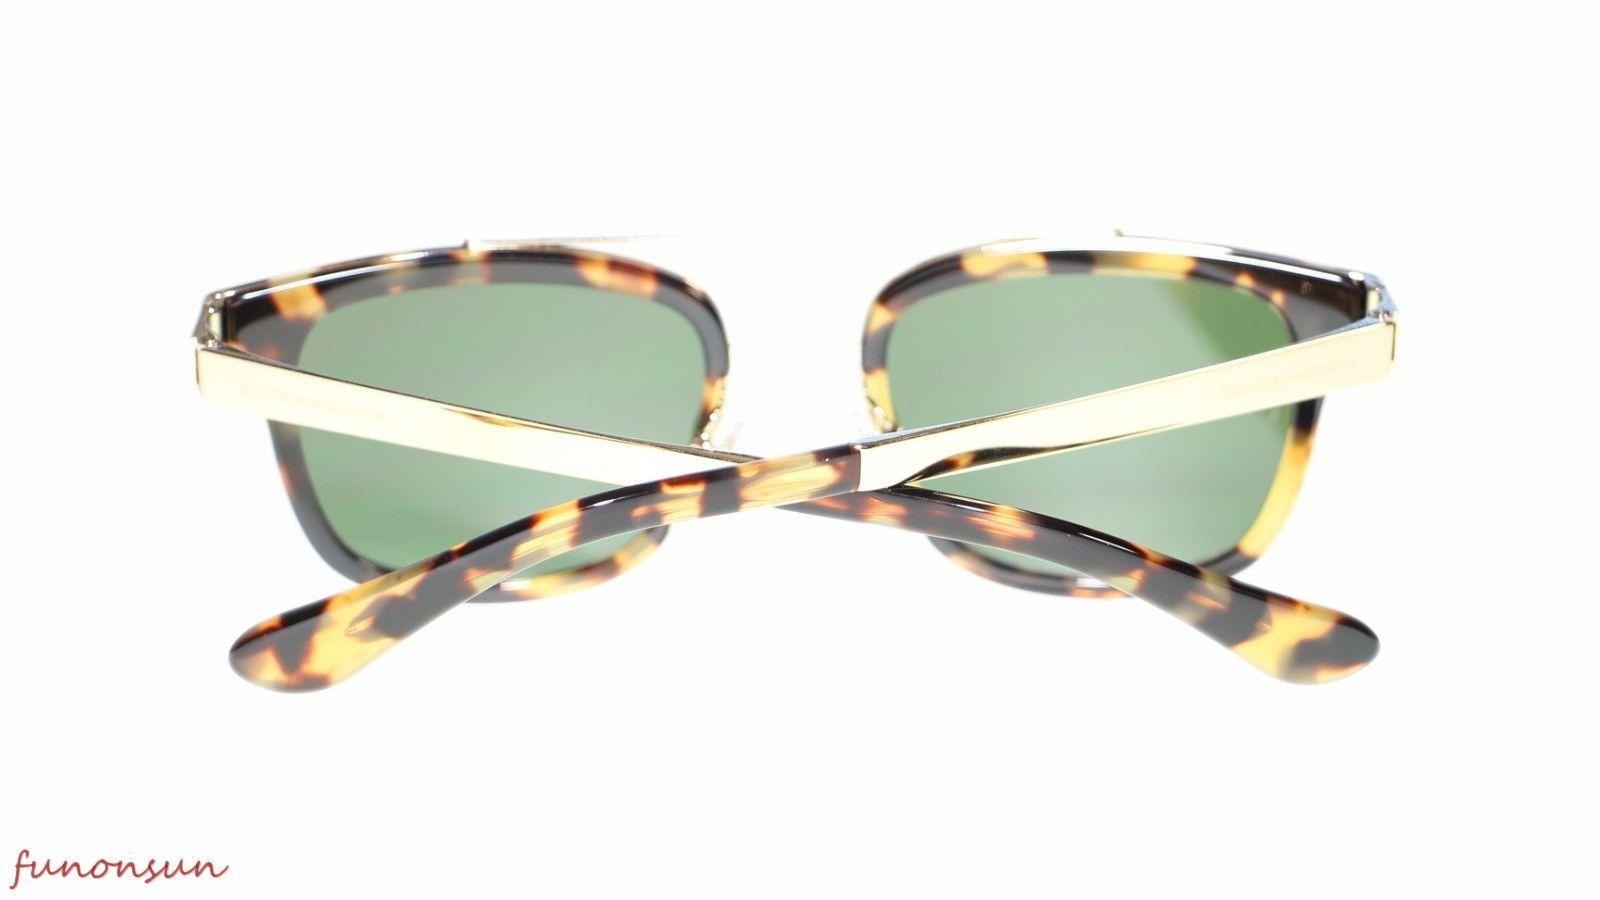 Dolce Gabbana Men's Sunglasses DG2175 296971 Yellow Havana Green Lens 51mm